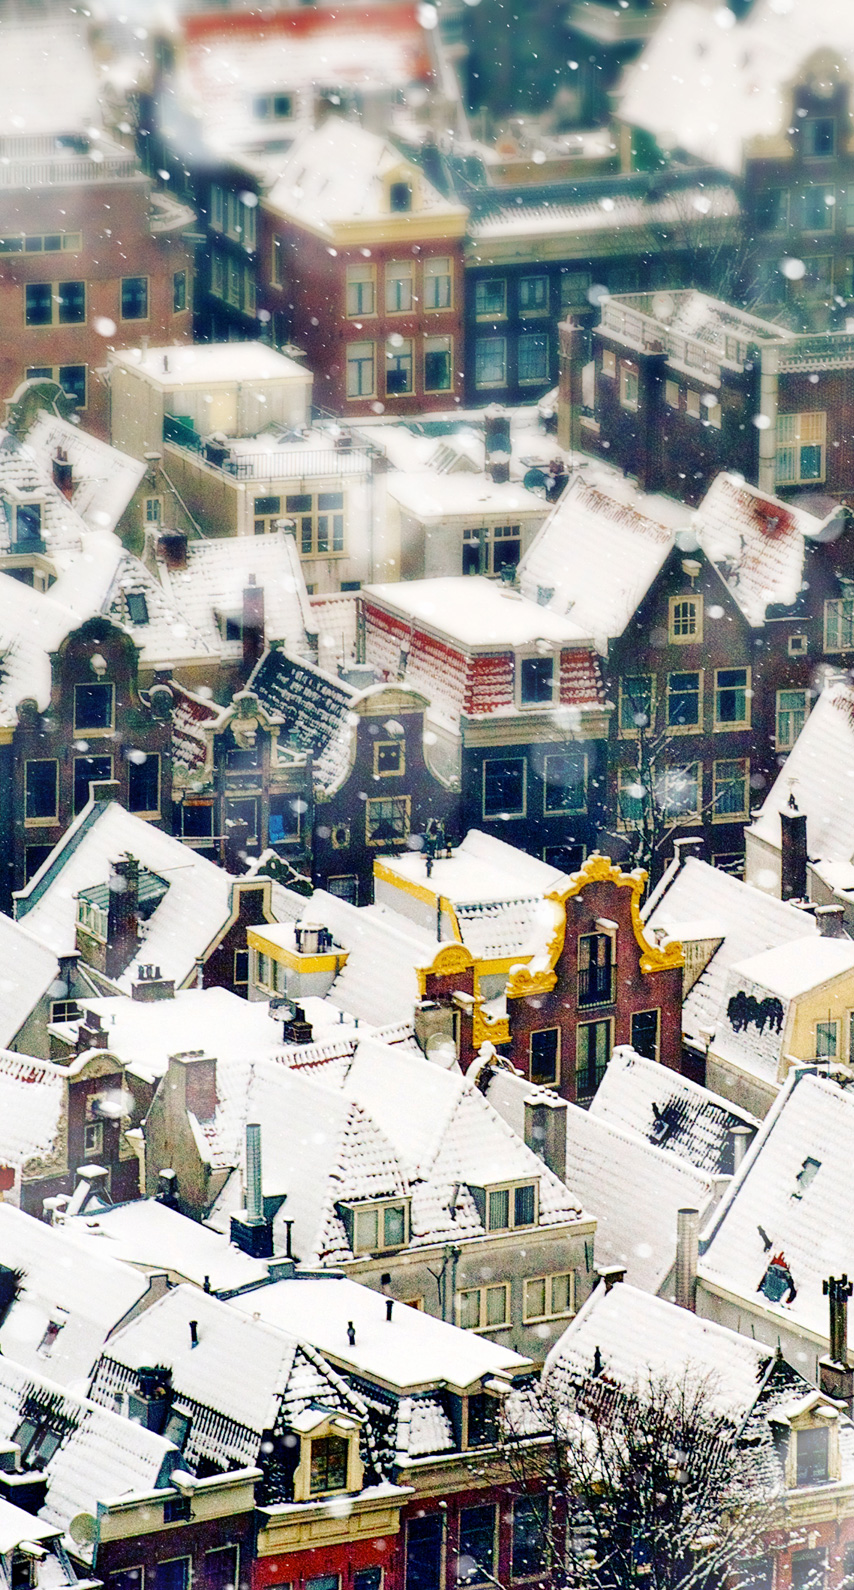 suburb, residential area